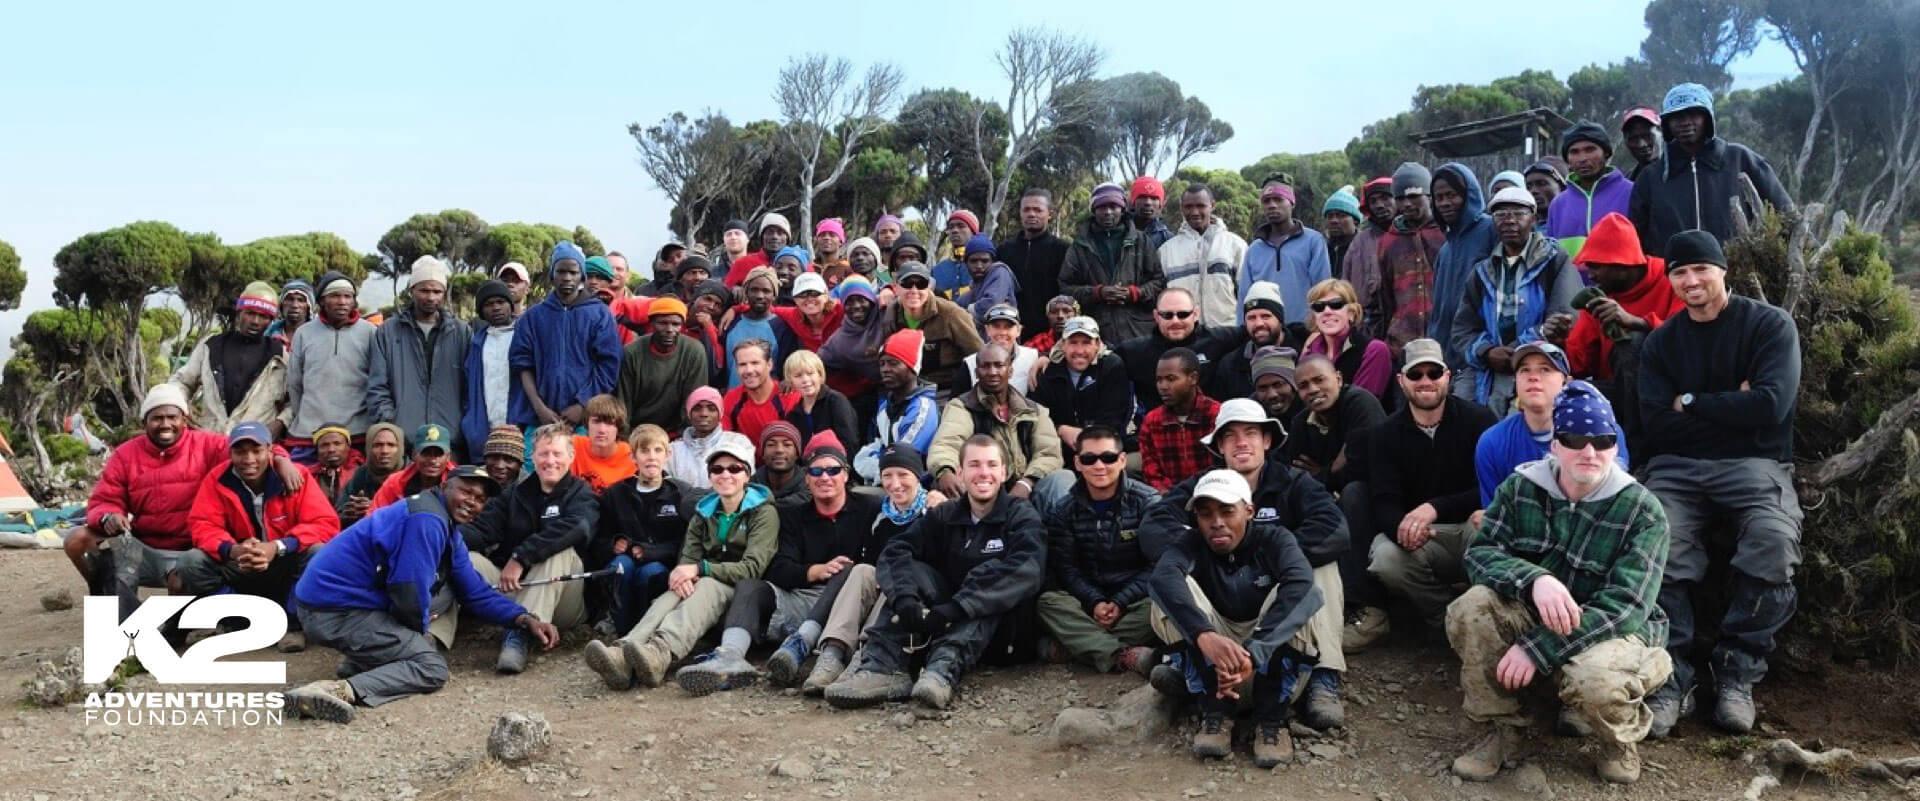 Mt. Kilimanjaro summit with K2 Adventures